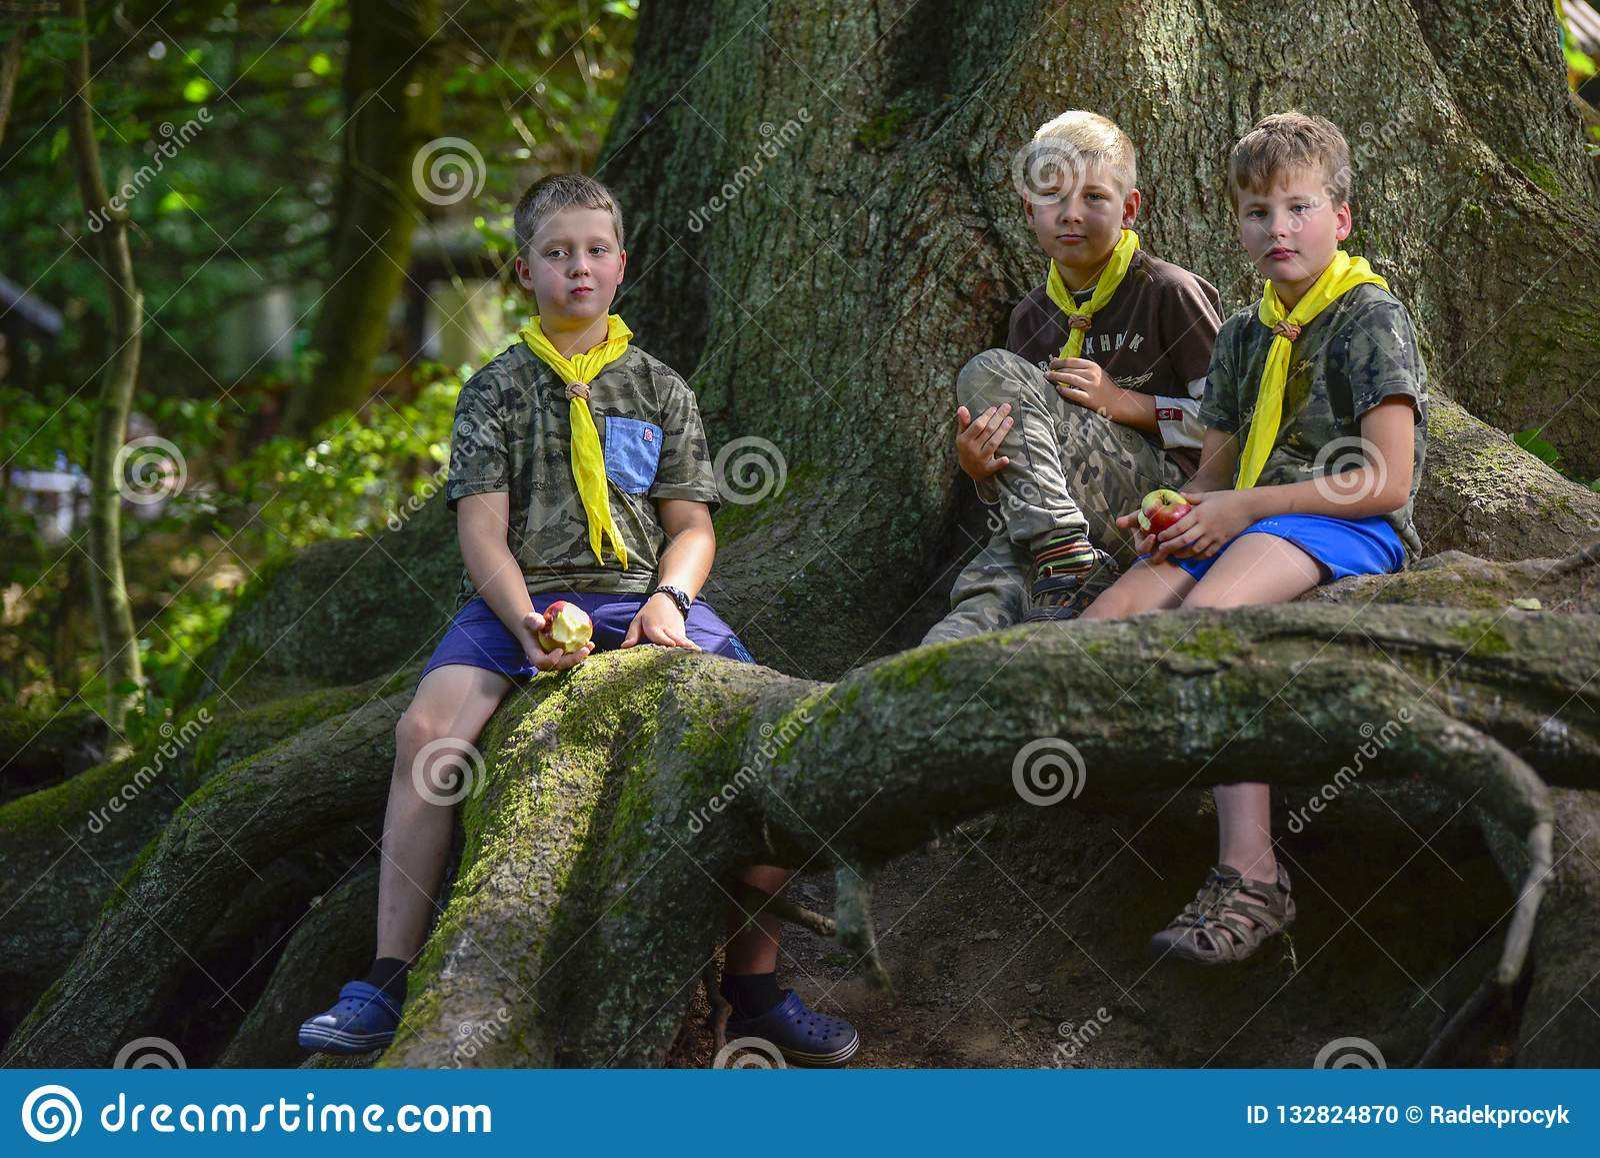 Czech Boy And Girl Scouts During Their Summer Camp  Czech